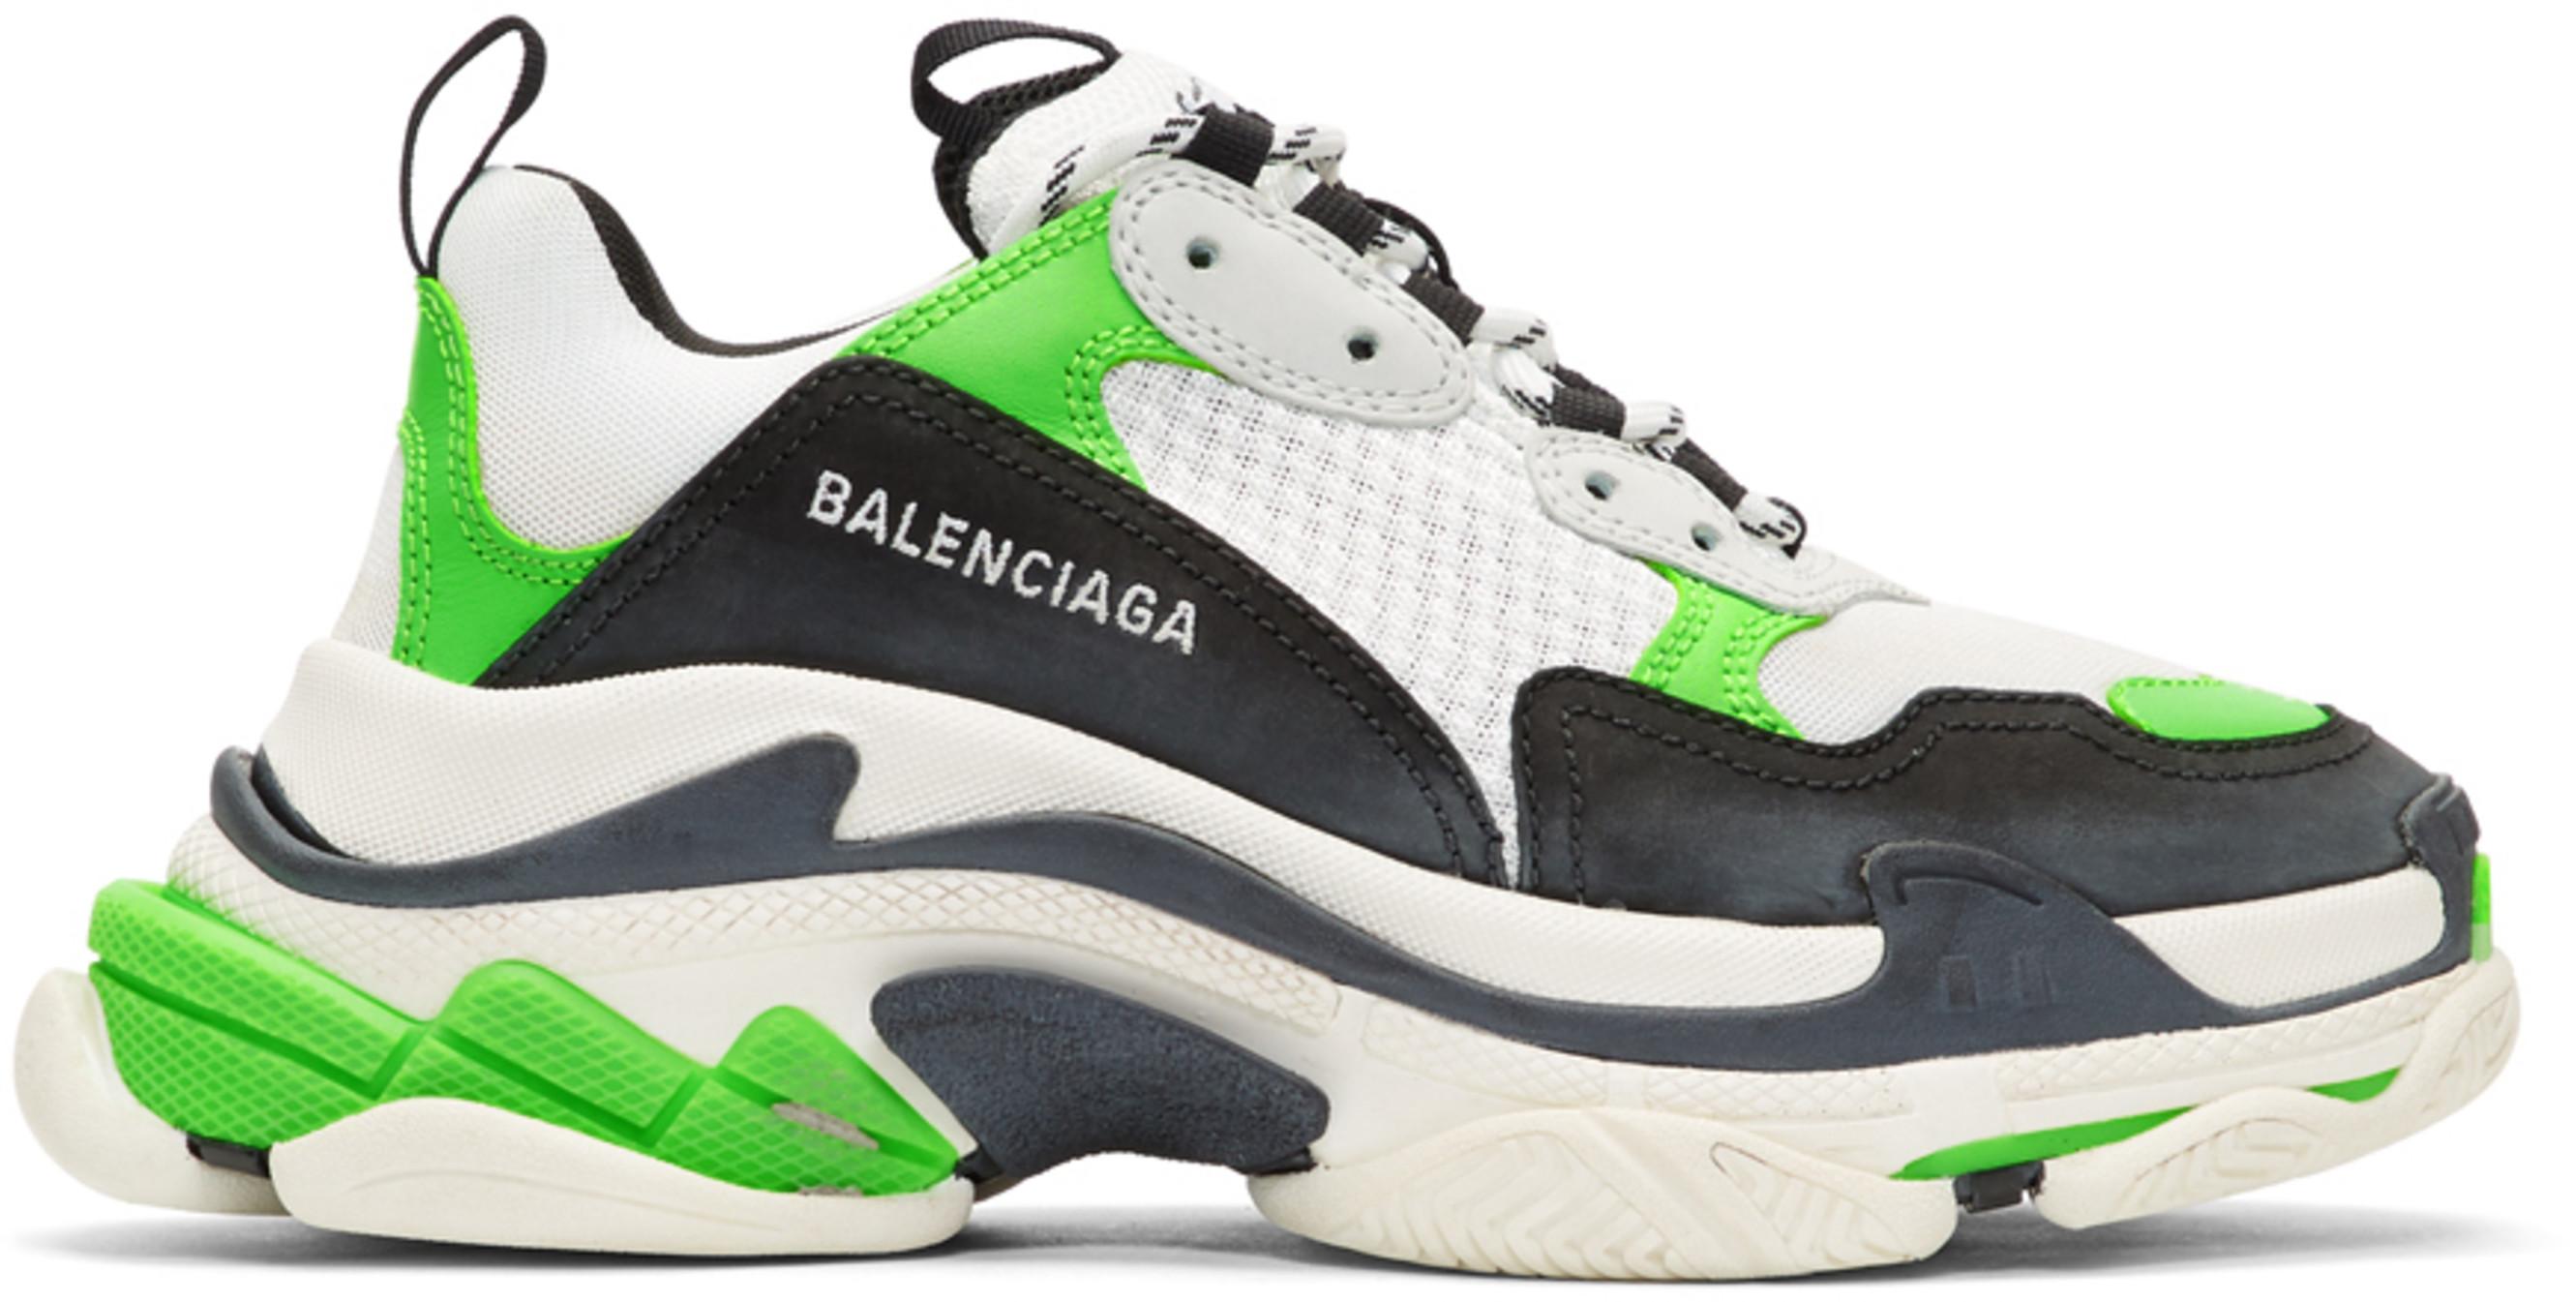 Shoes Balenciaga For Balenciaga Balenciaga MenSsense For Shoes MenSsense Shoes 8nN0wm